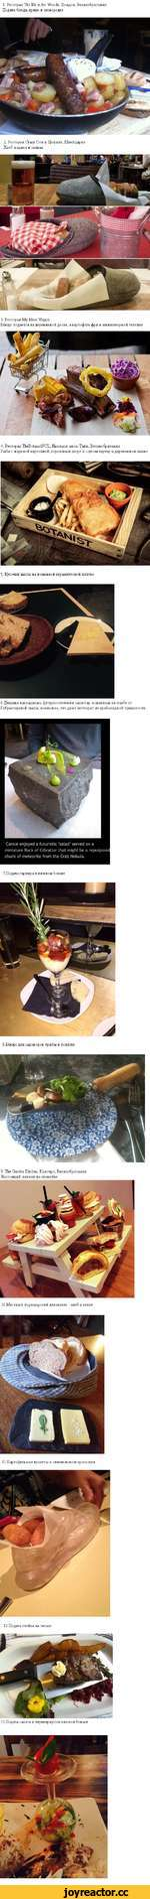 "Carole enjoyed a futuristic ""salad"" served on a miniature Rock of Gibratlar that might be a repurpos chunk of meteorite from the Crab Nebula. 1.Ресторан The Elk in the Woods, Лондон, Великобритания Подача блюда прямо в сковородке 2.Ресторан Crazy Cow в Цюрихе, Швейцария Хлеб подают в тапках 3."